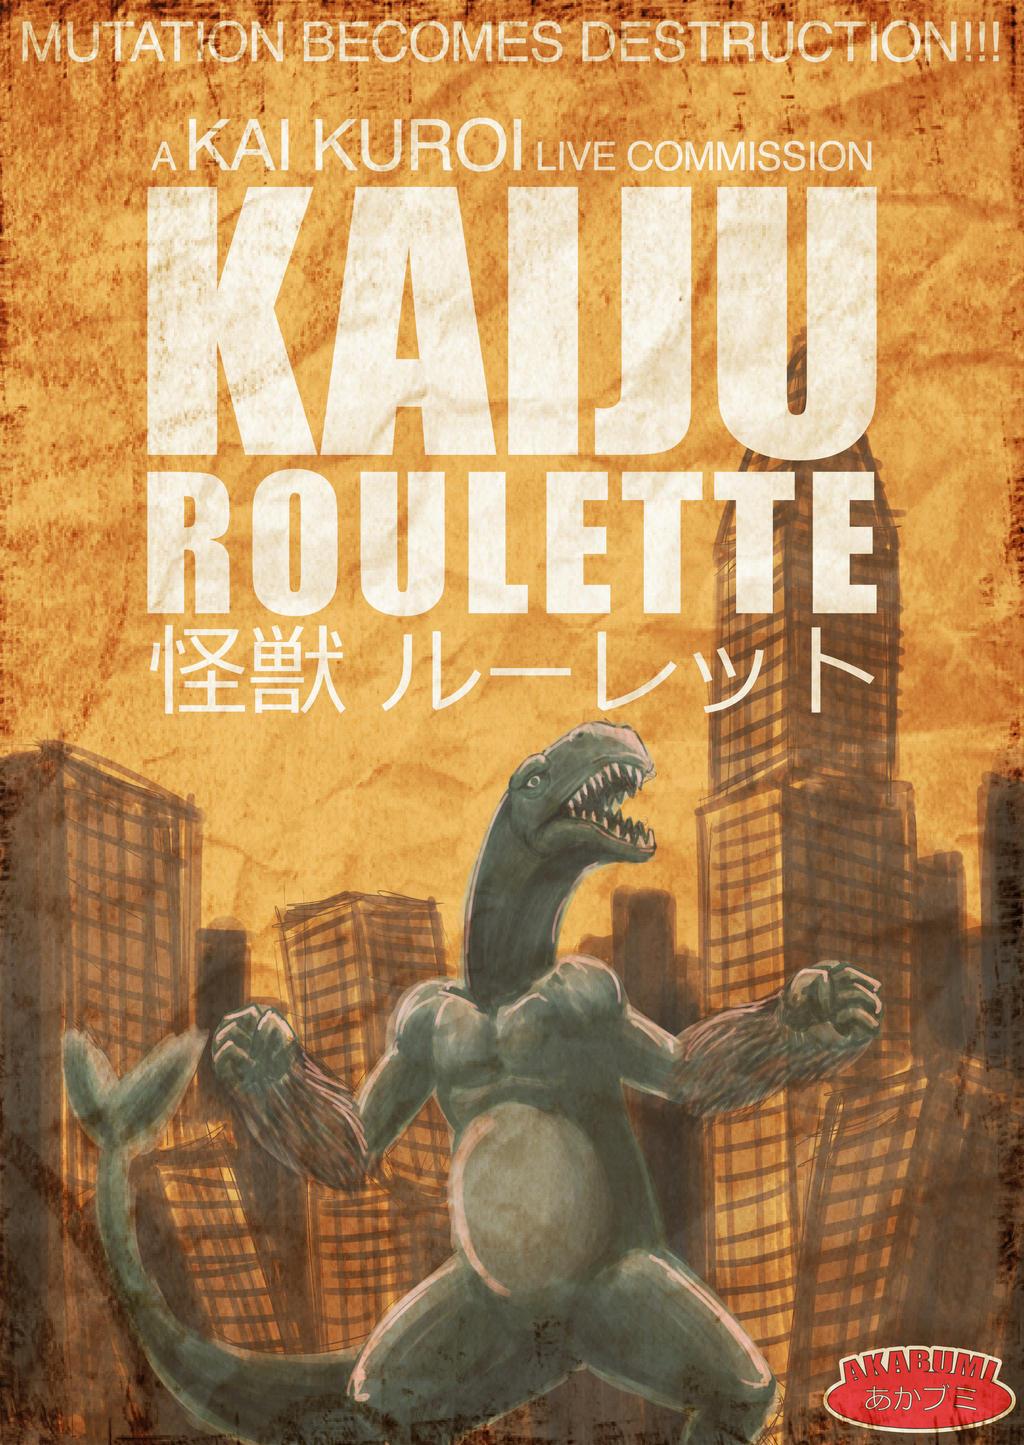 KAIJU ROULETTE at COMIC FIESTA 2014 by KuroiKai-tmk